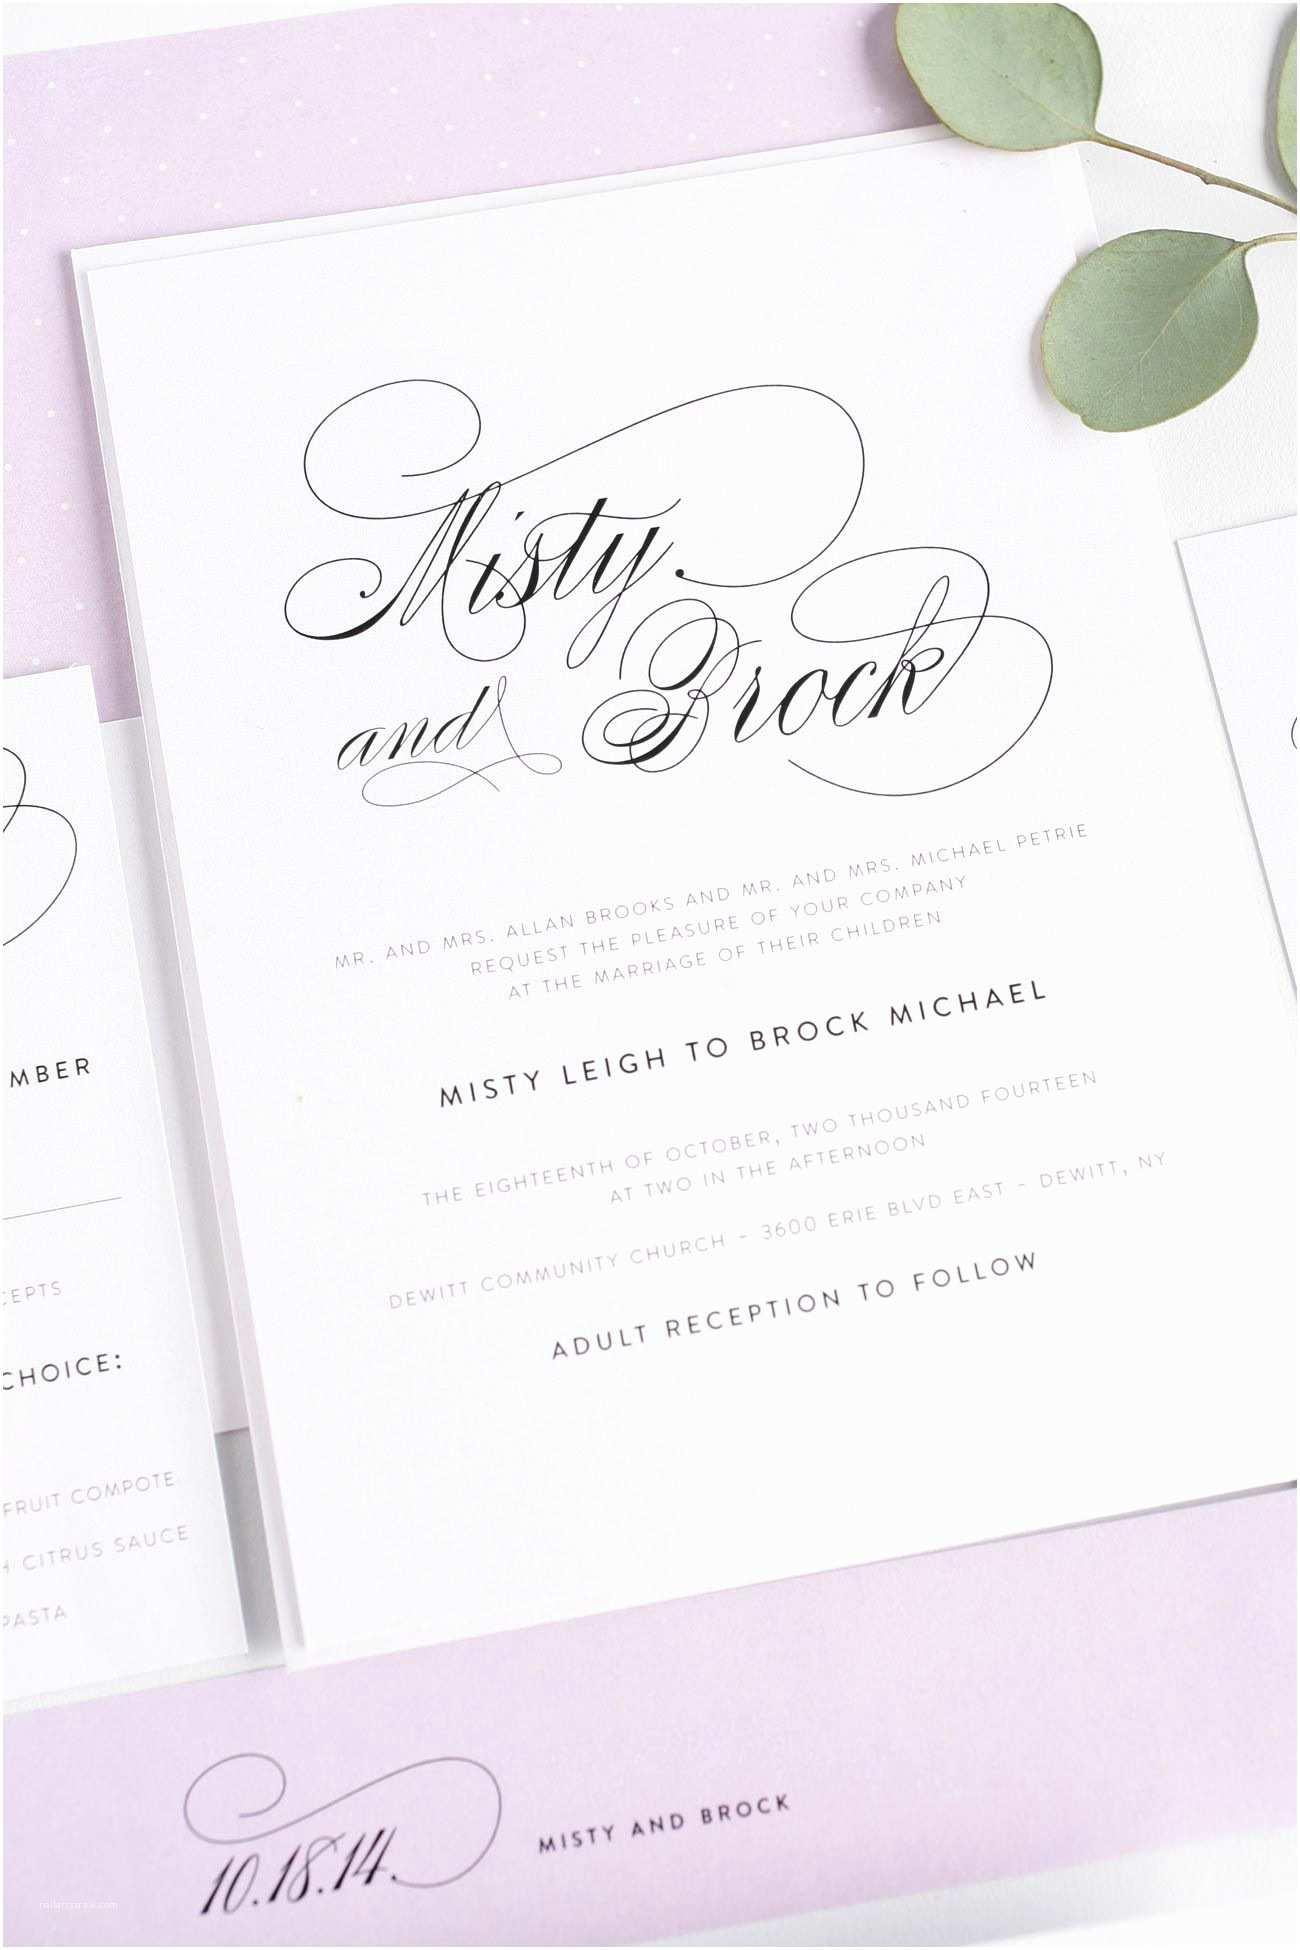 Wedding Invitation Envelopes Wedding Invitation Envelope Etiquette Wording Yaseen for